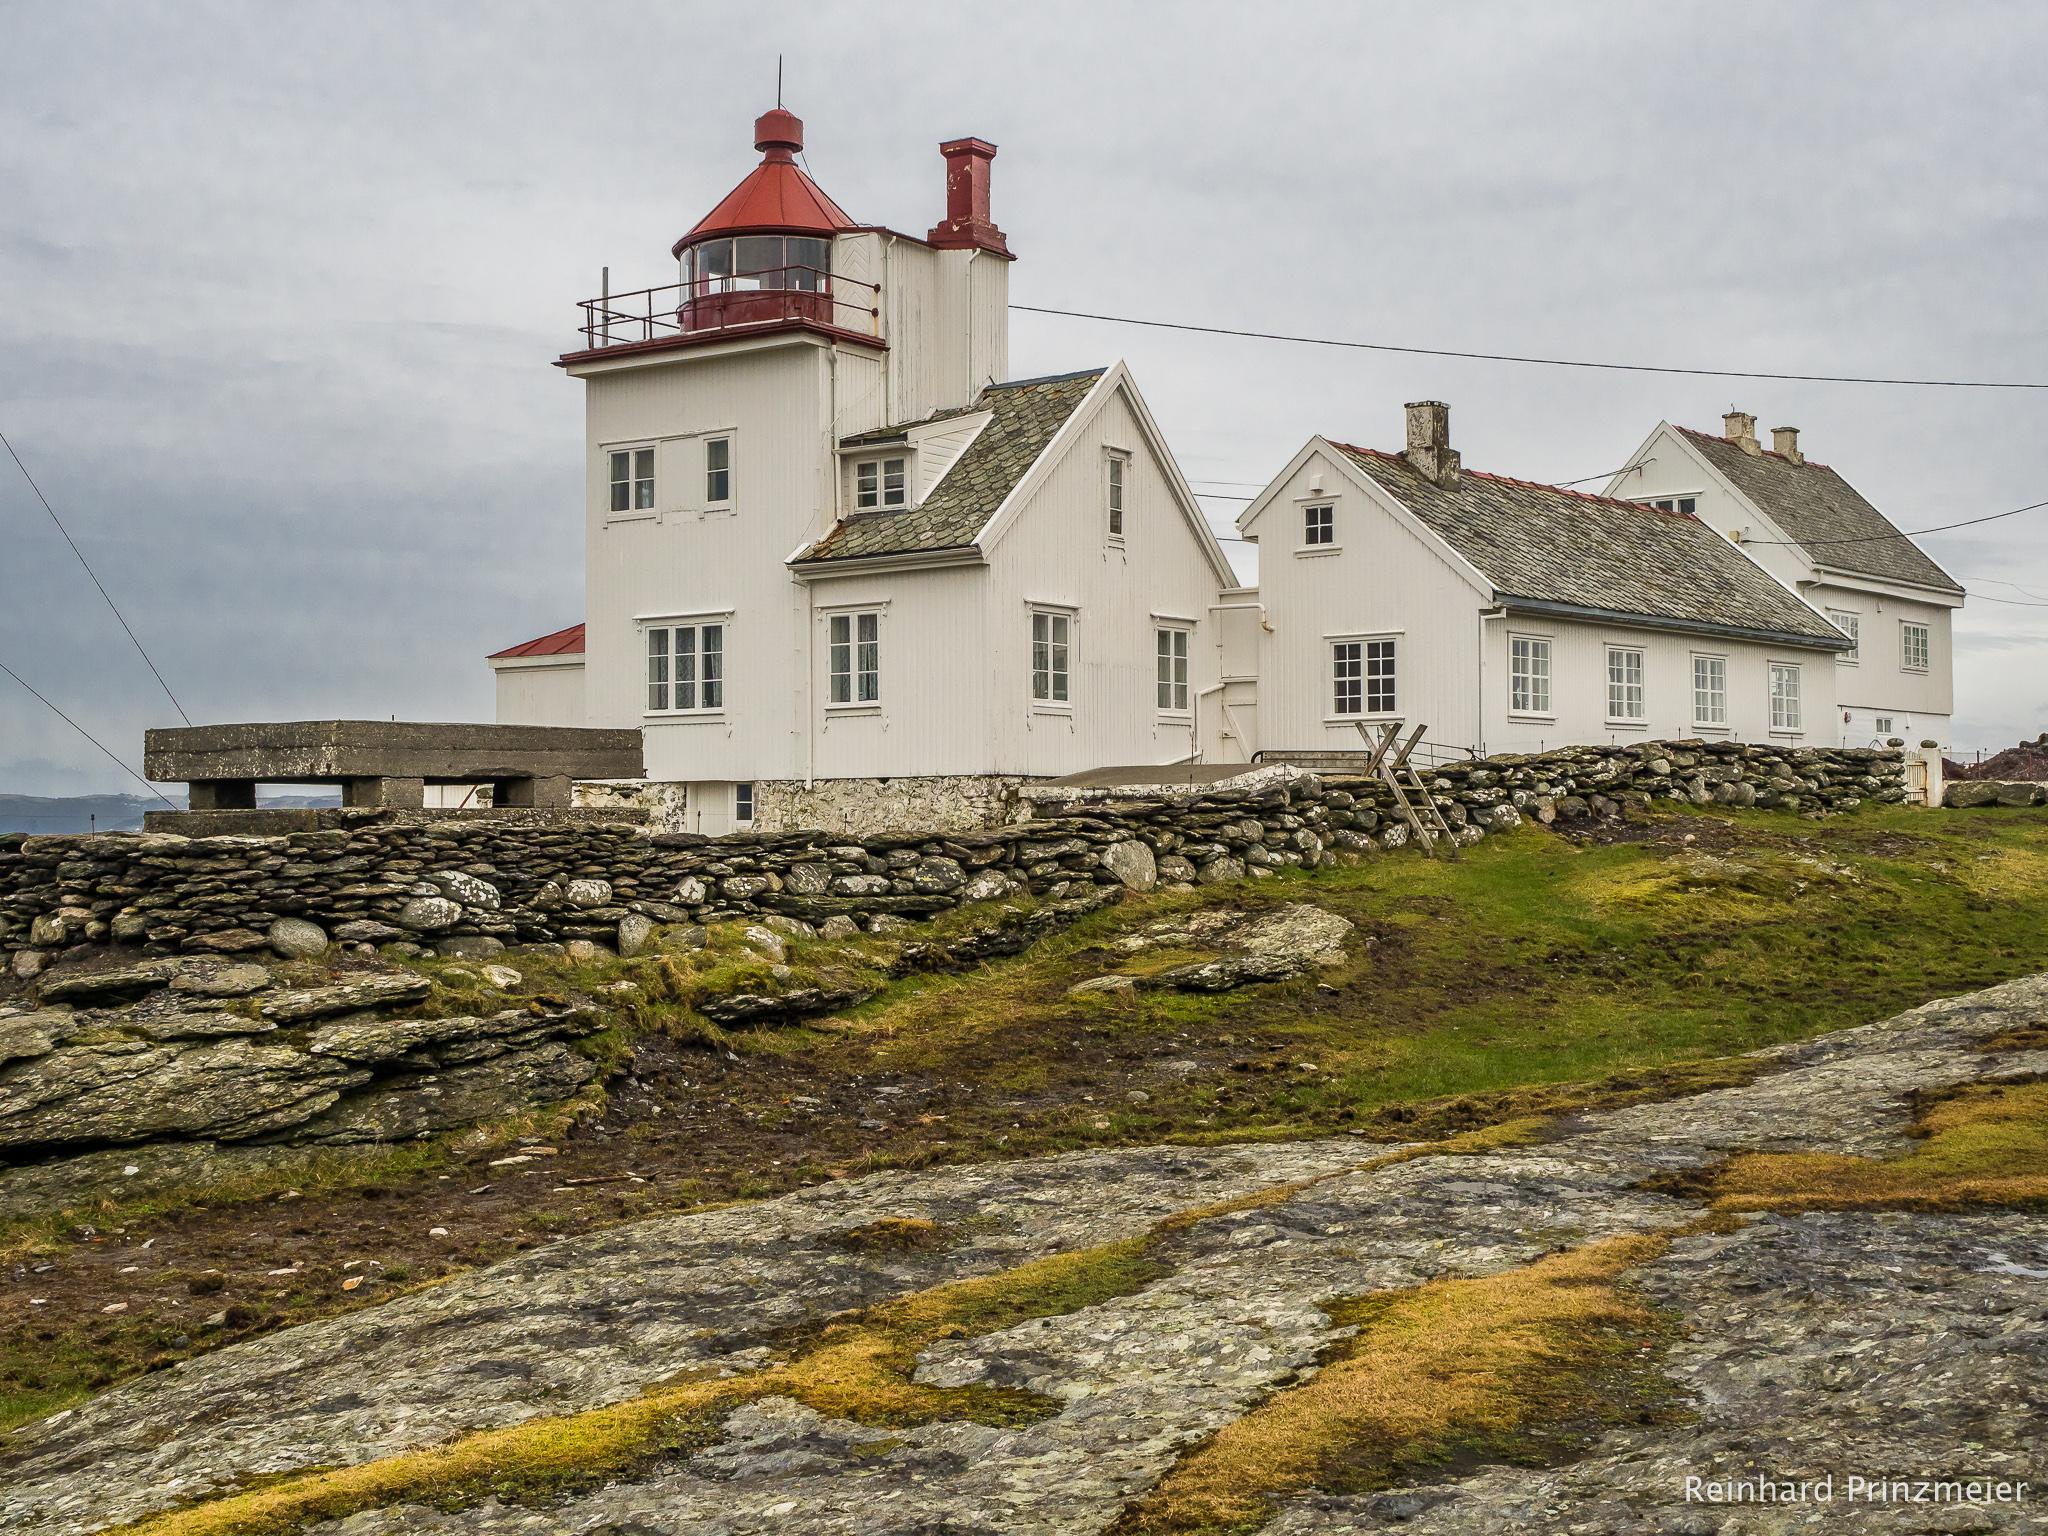 Tungenes fyr Lighthouse, Norway